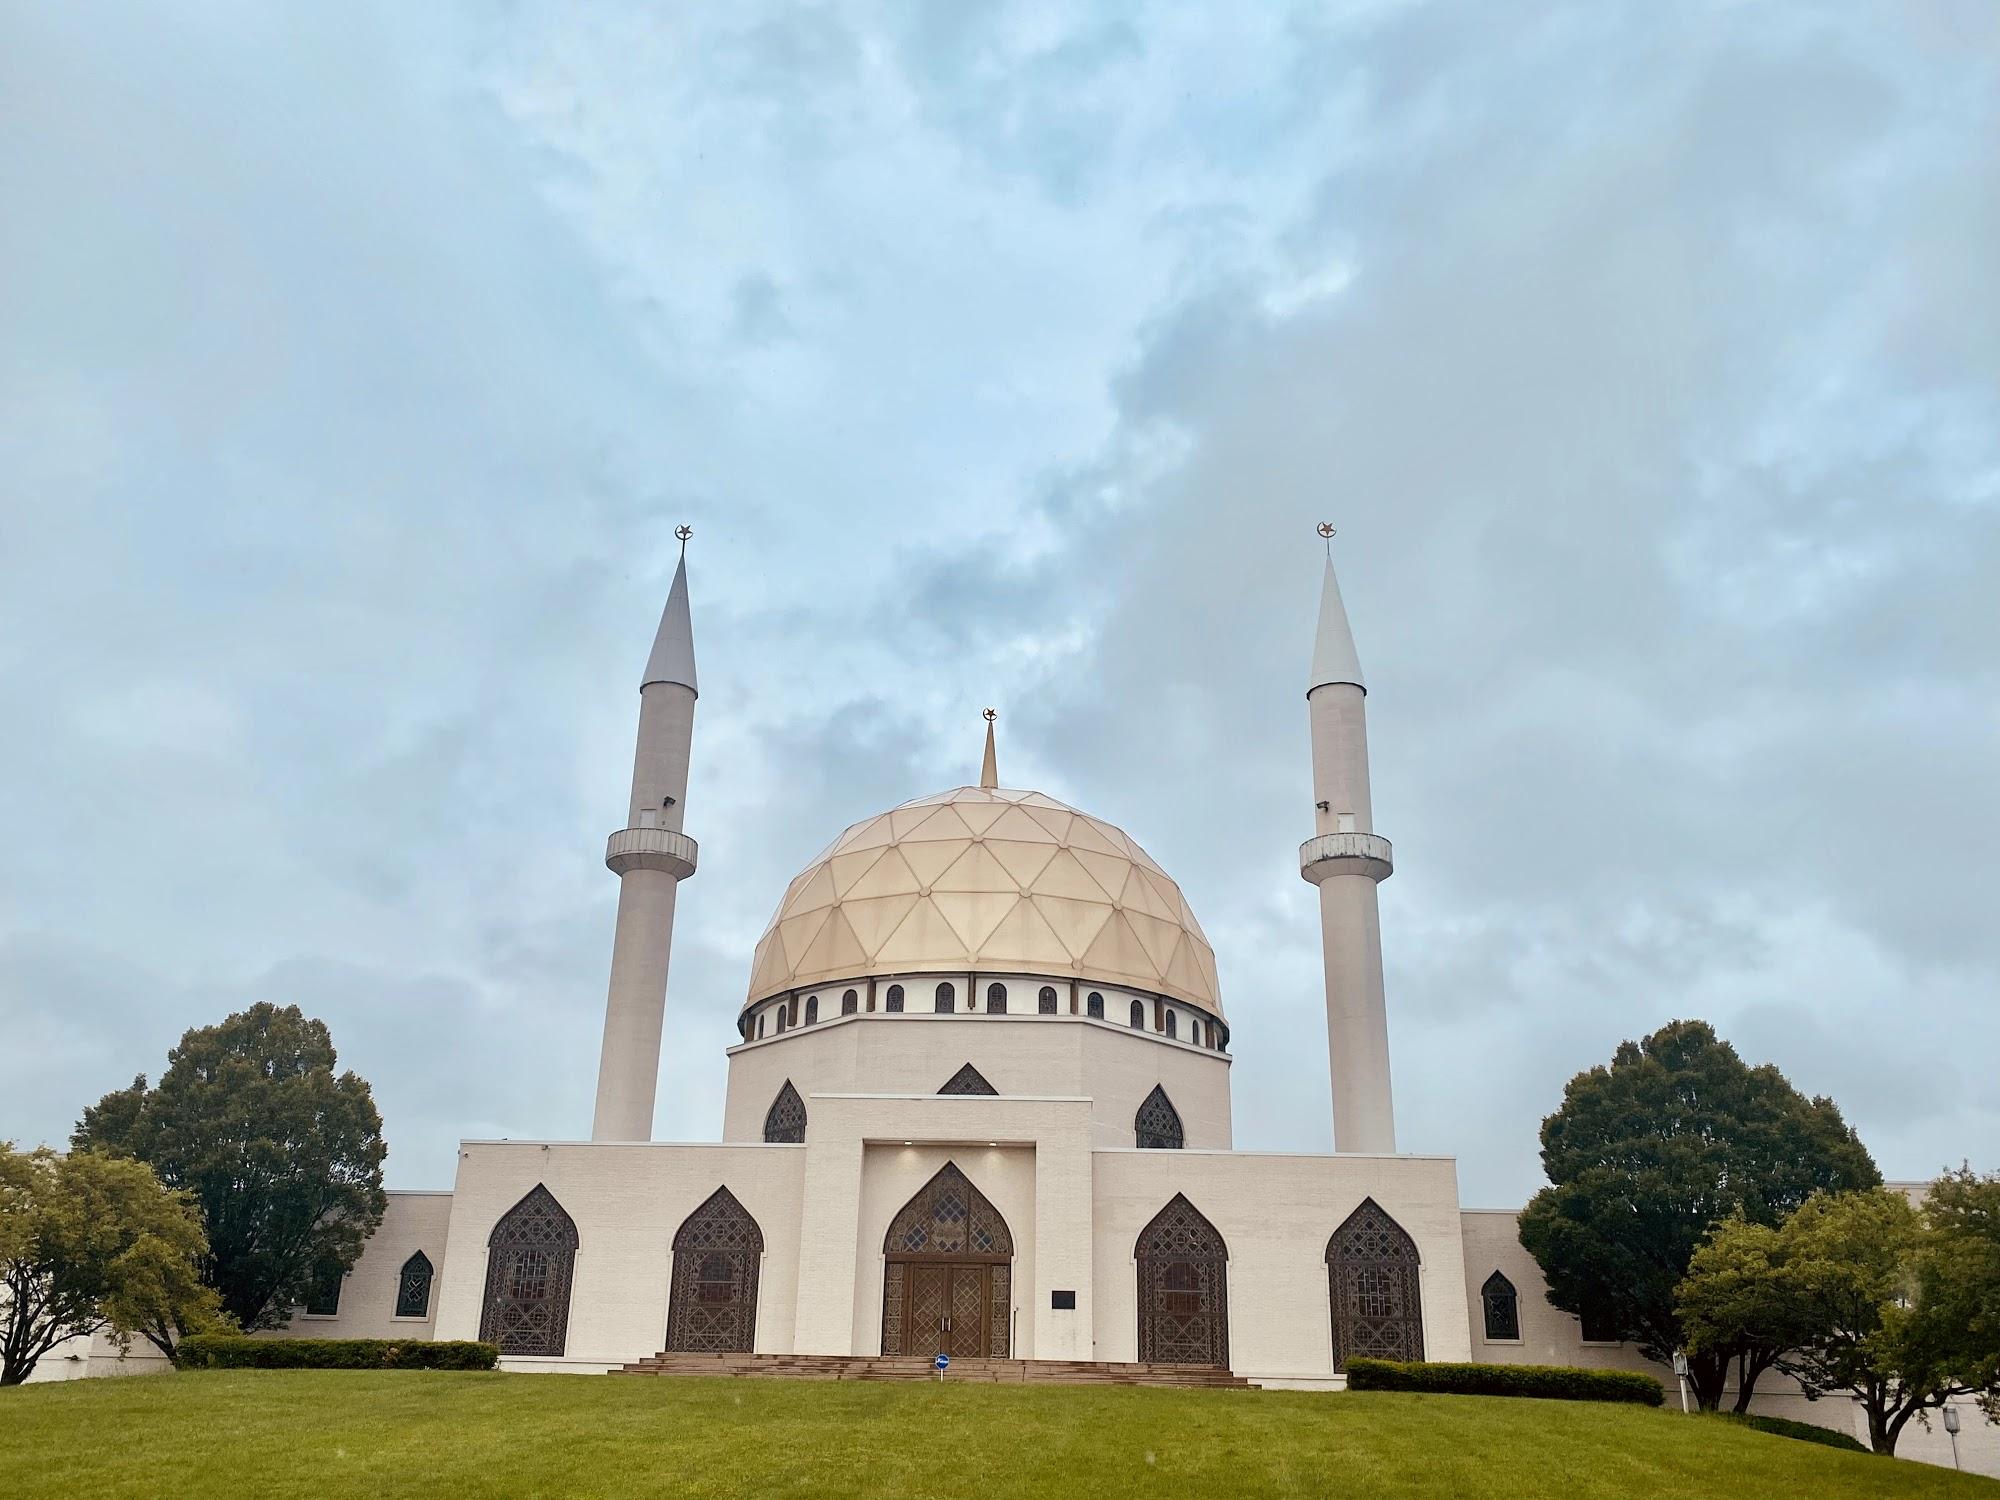 Islamic Center of Greater Toledo (ICGT) 25877 Scheider Rd, Perrysburg